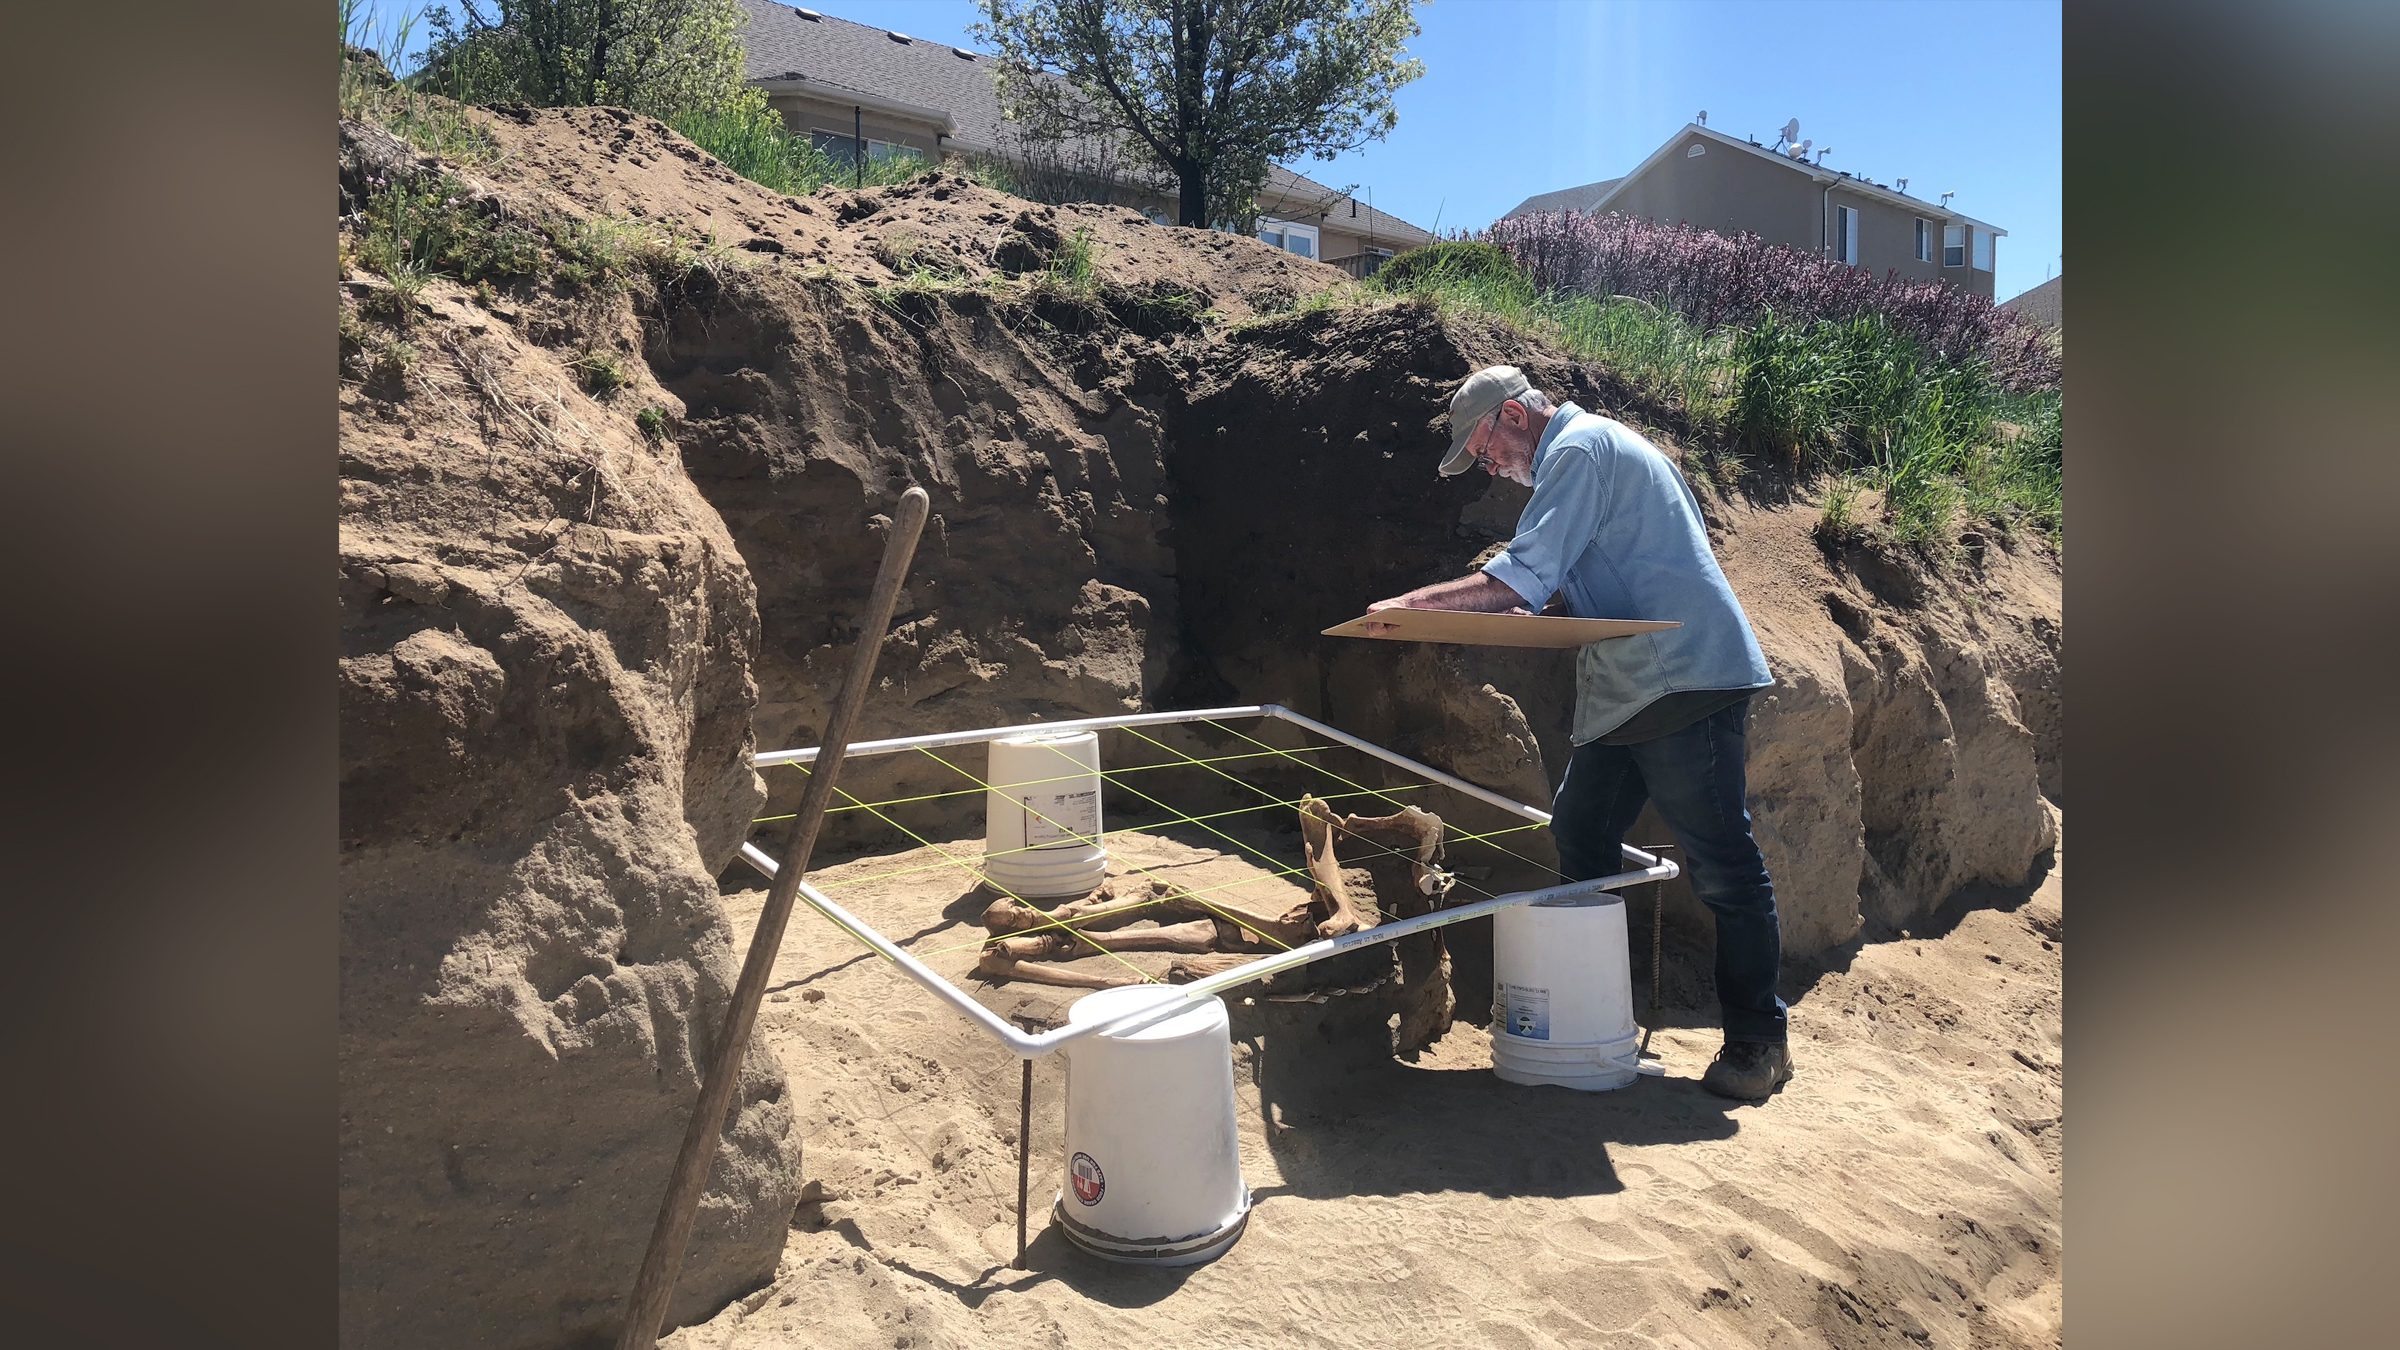 Paleontologist Rick Hunter excavates the Lehi horse skeleton from a backyard in Utah.